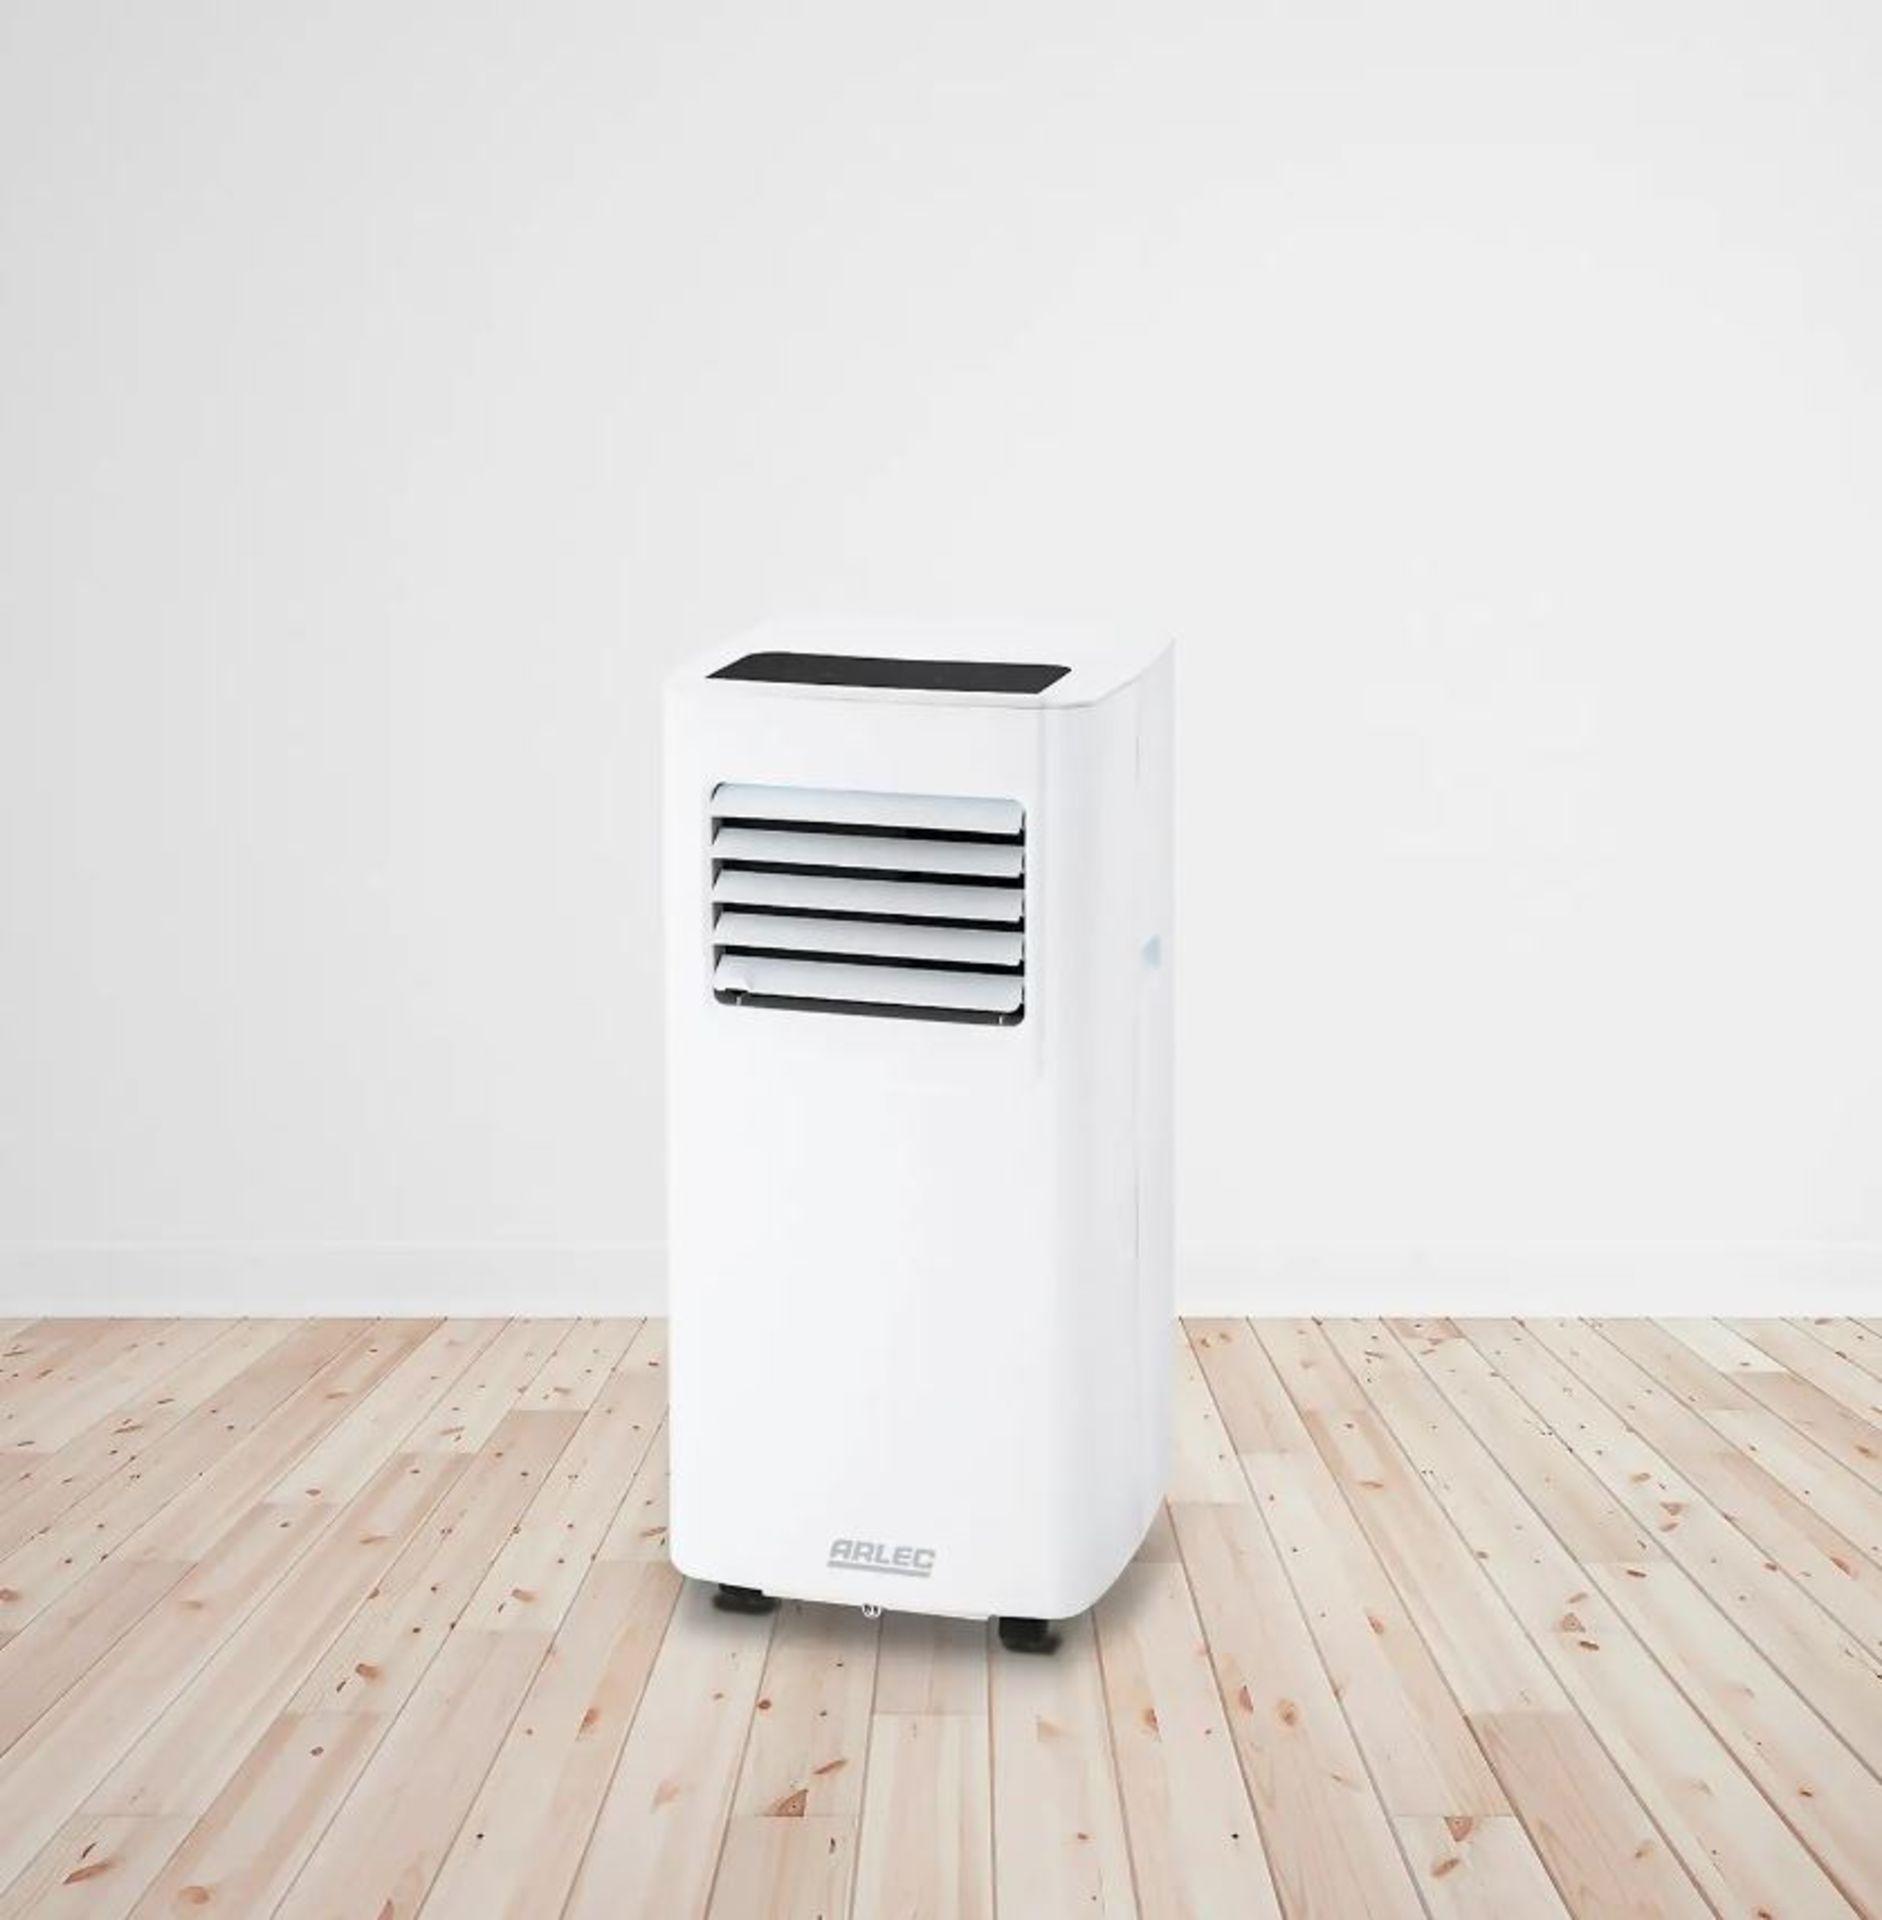 (P2) 1x Arlec Portable Air Conditioner 5000 BTU/h. RRP £300.00.